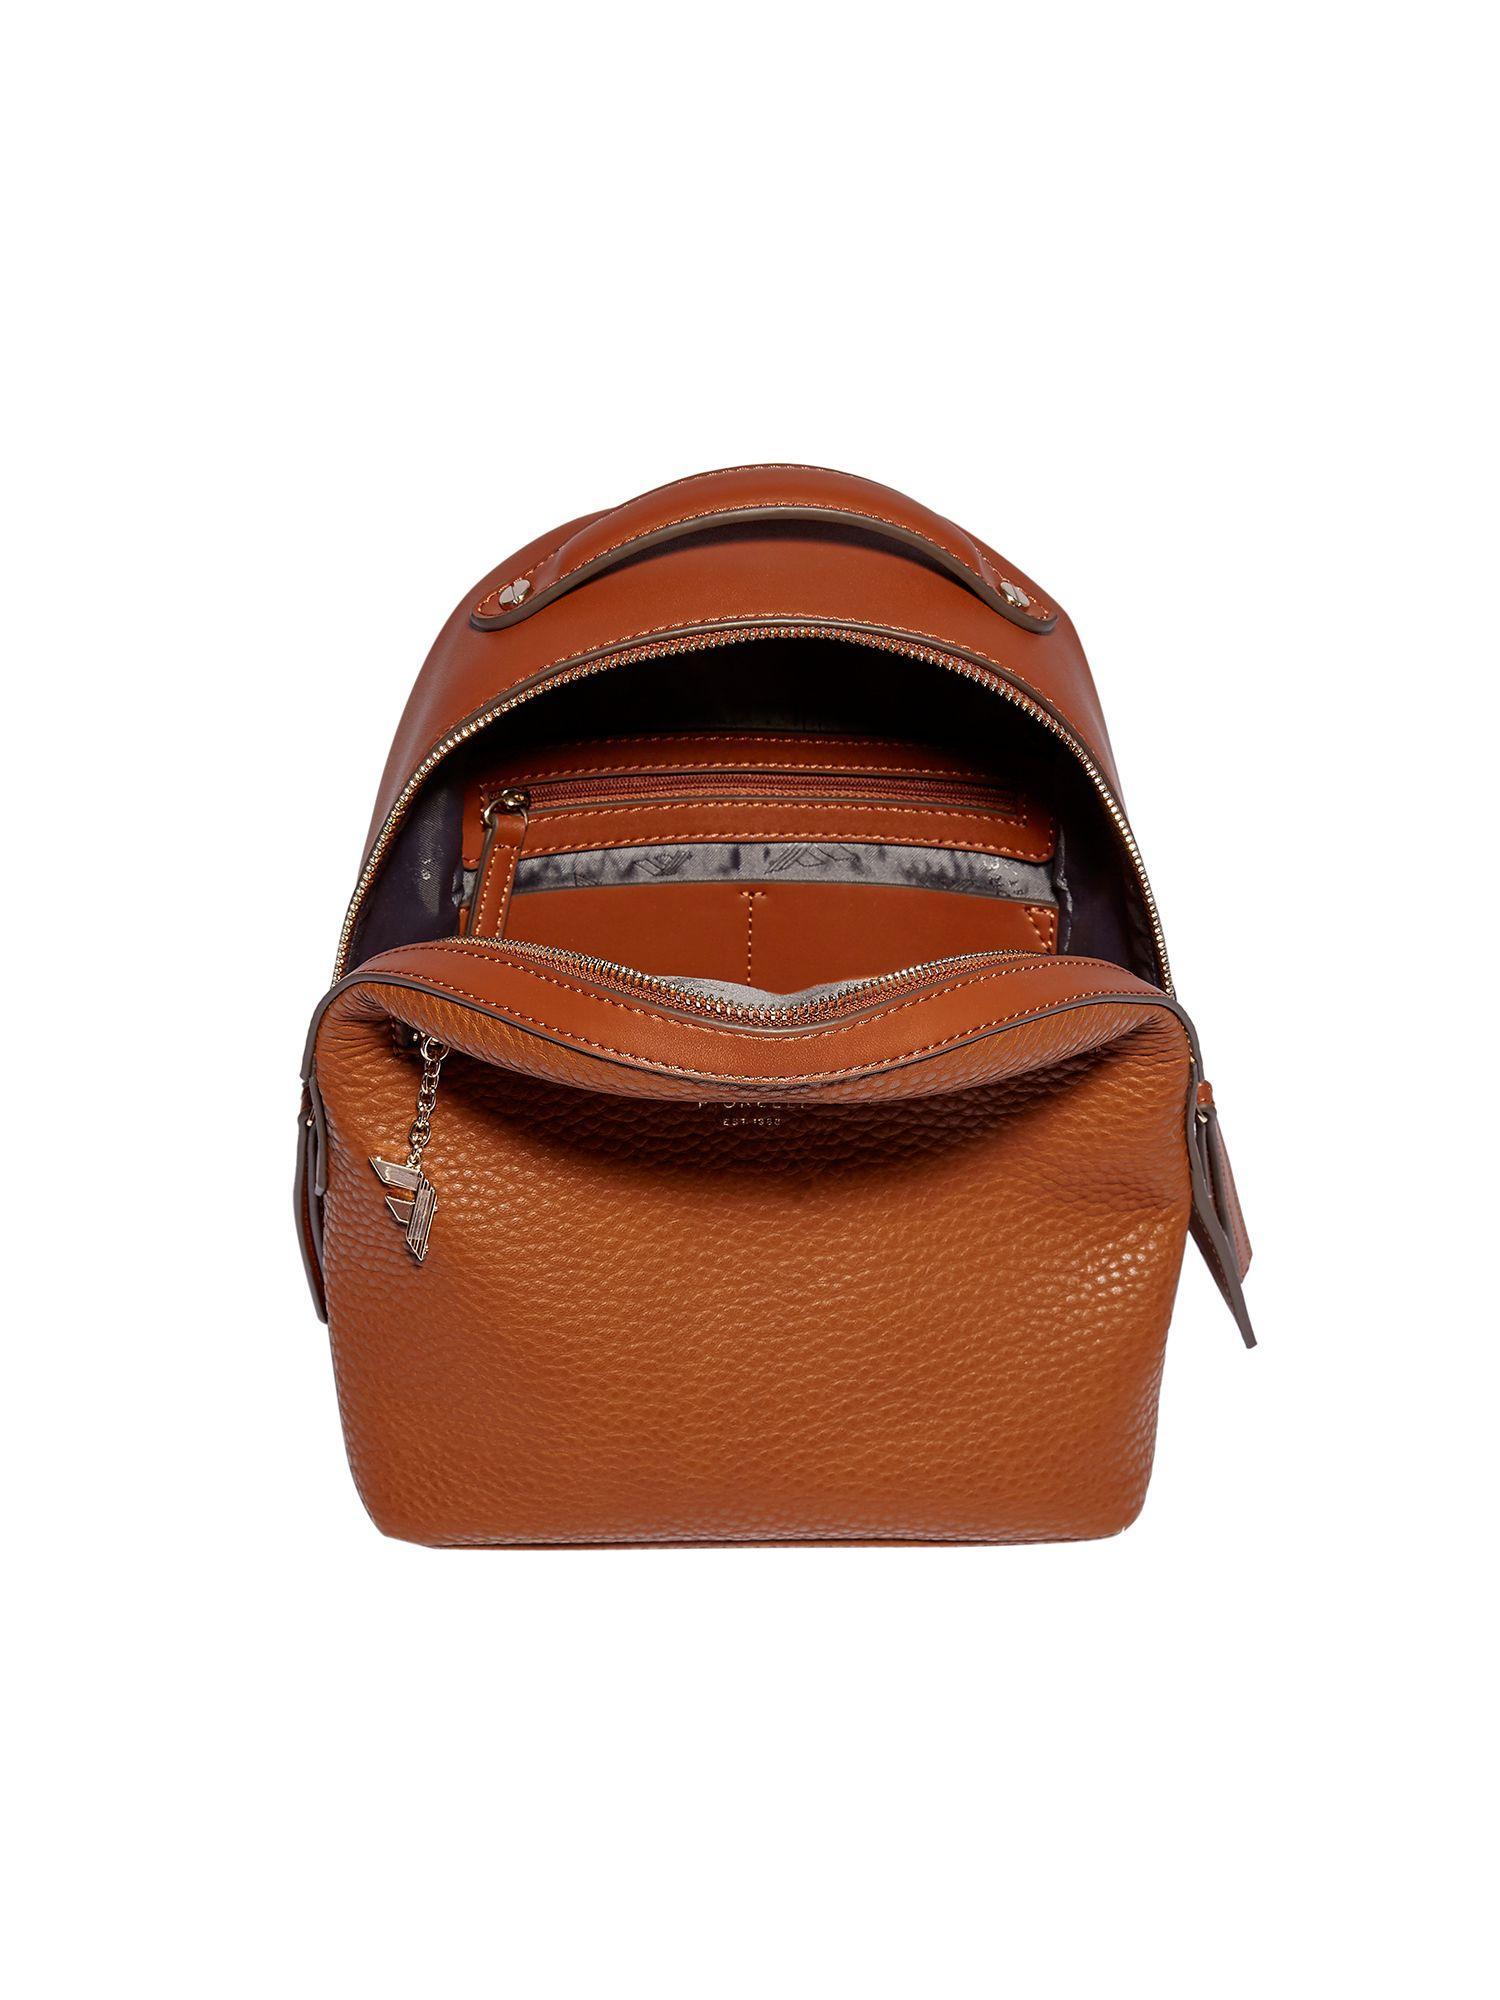 Fiorelli Anouk Mini Backpack in Tan (Brown)